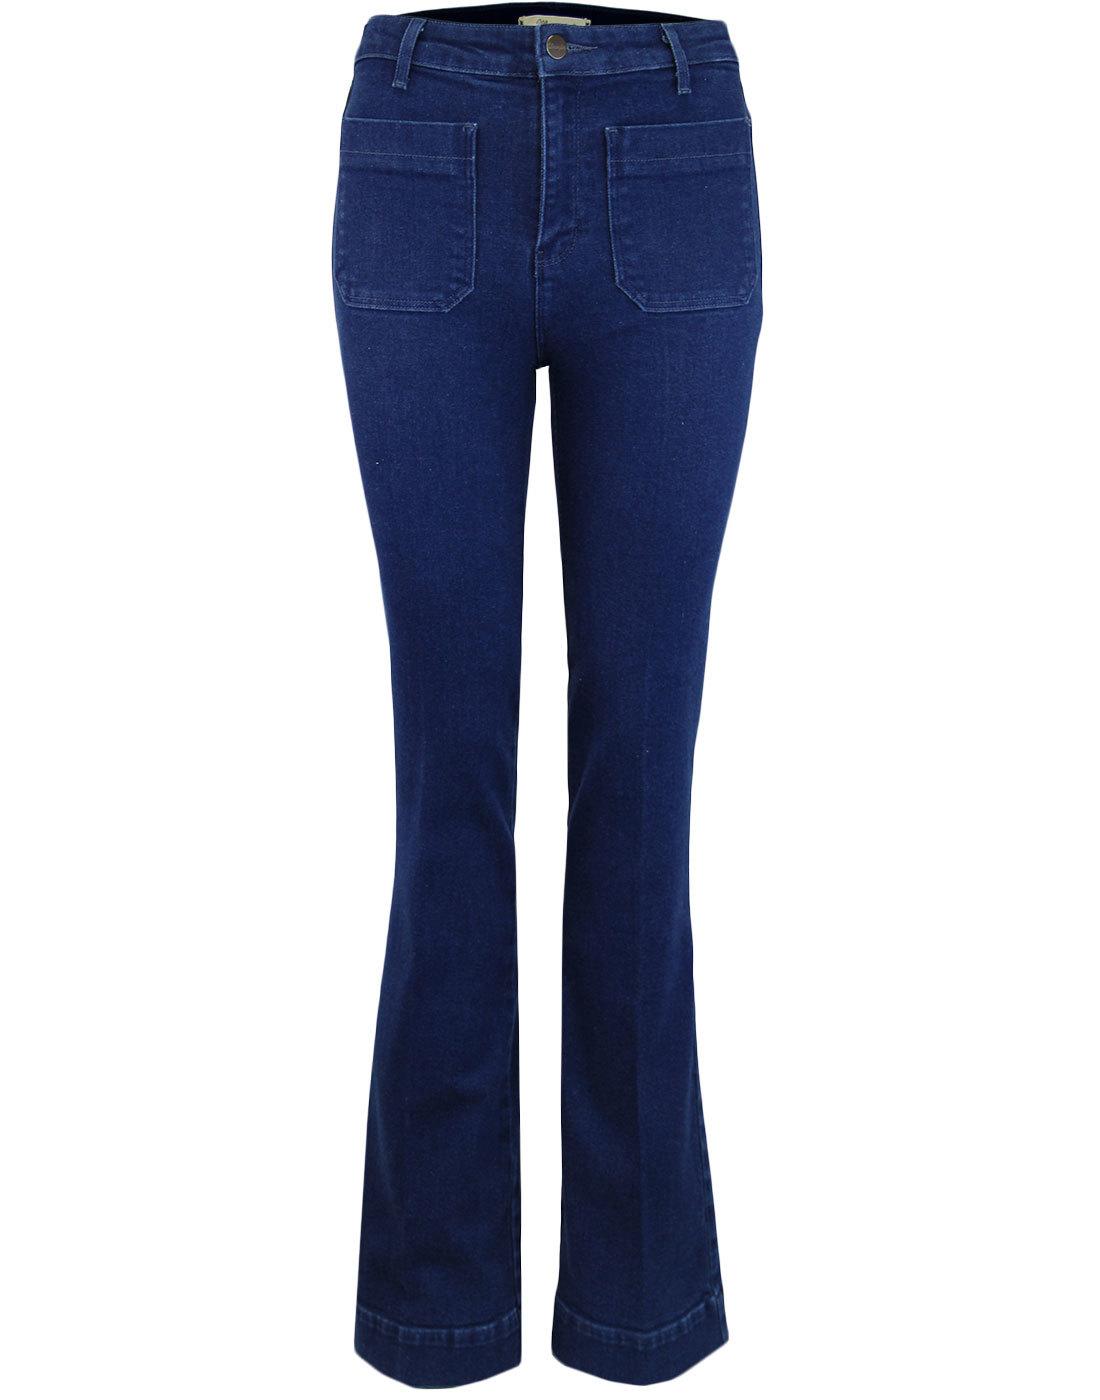 WRANGLER Retro 70s Flared Jeans with Rainbow Tag